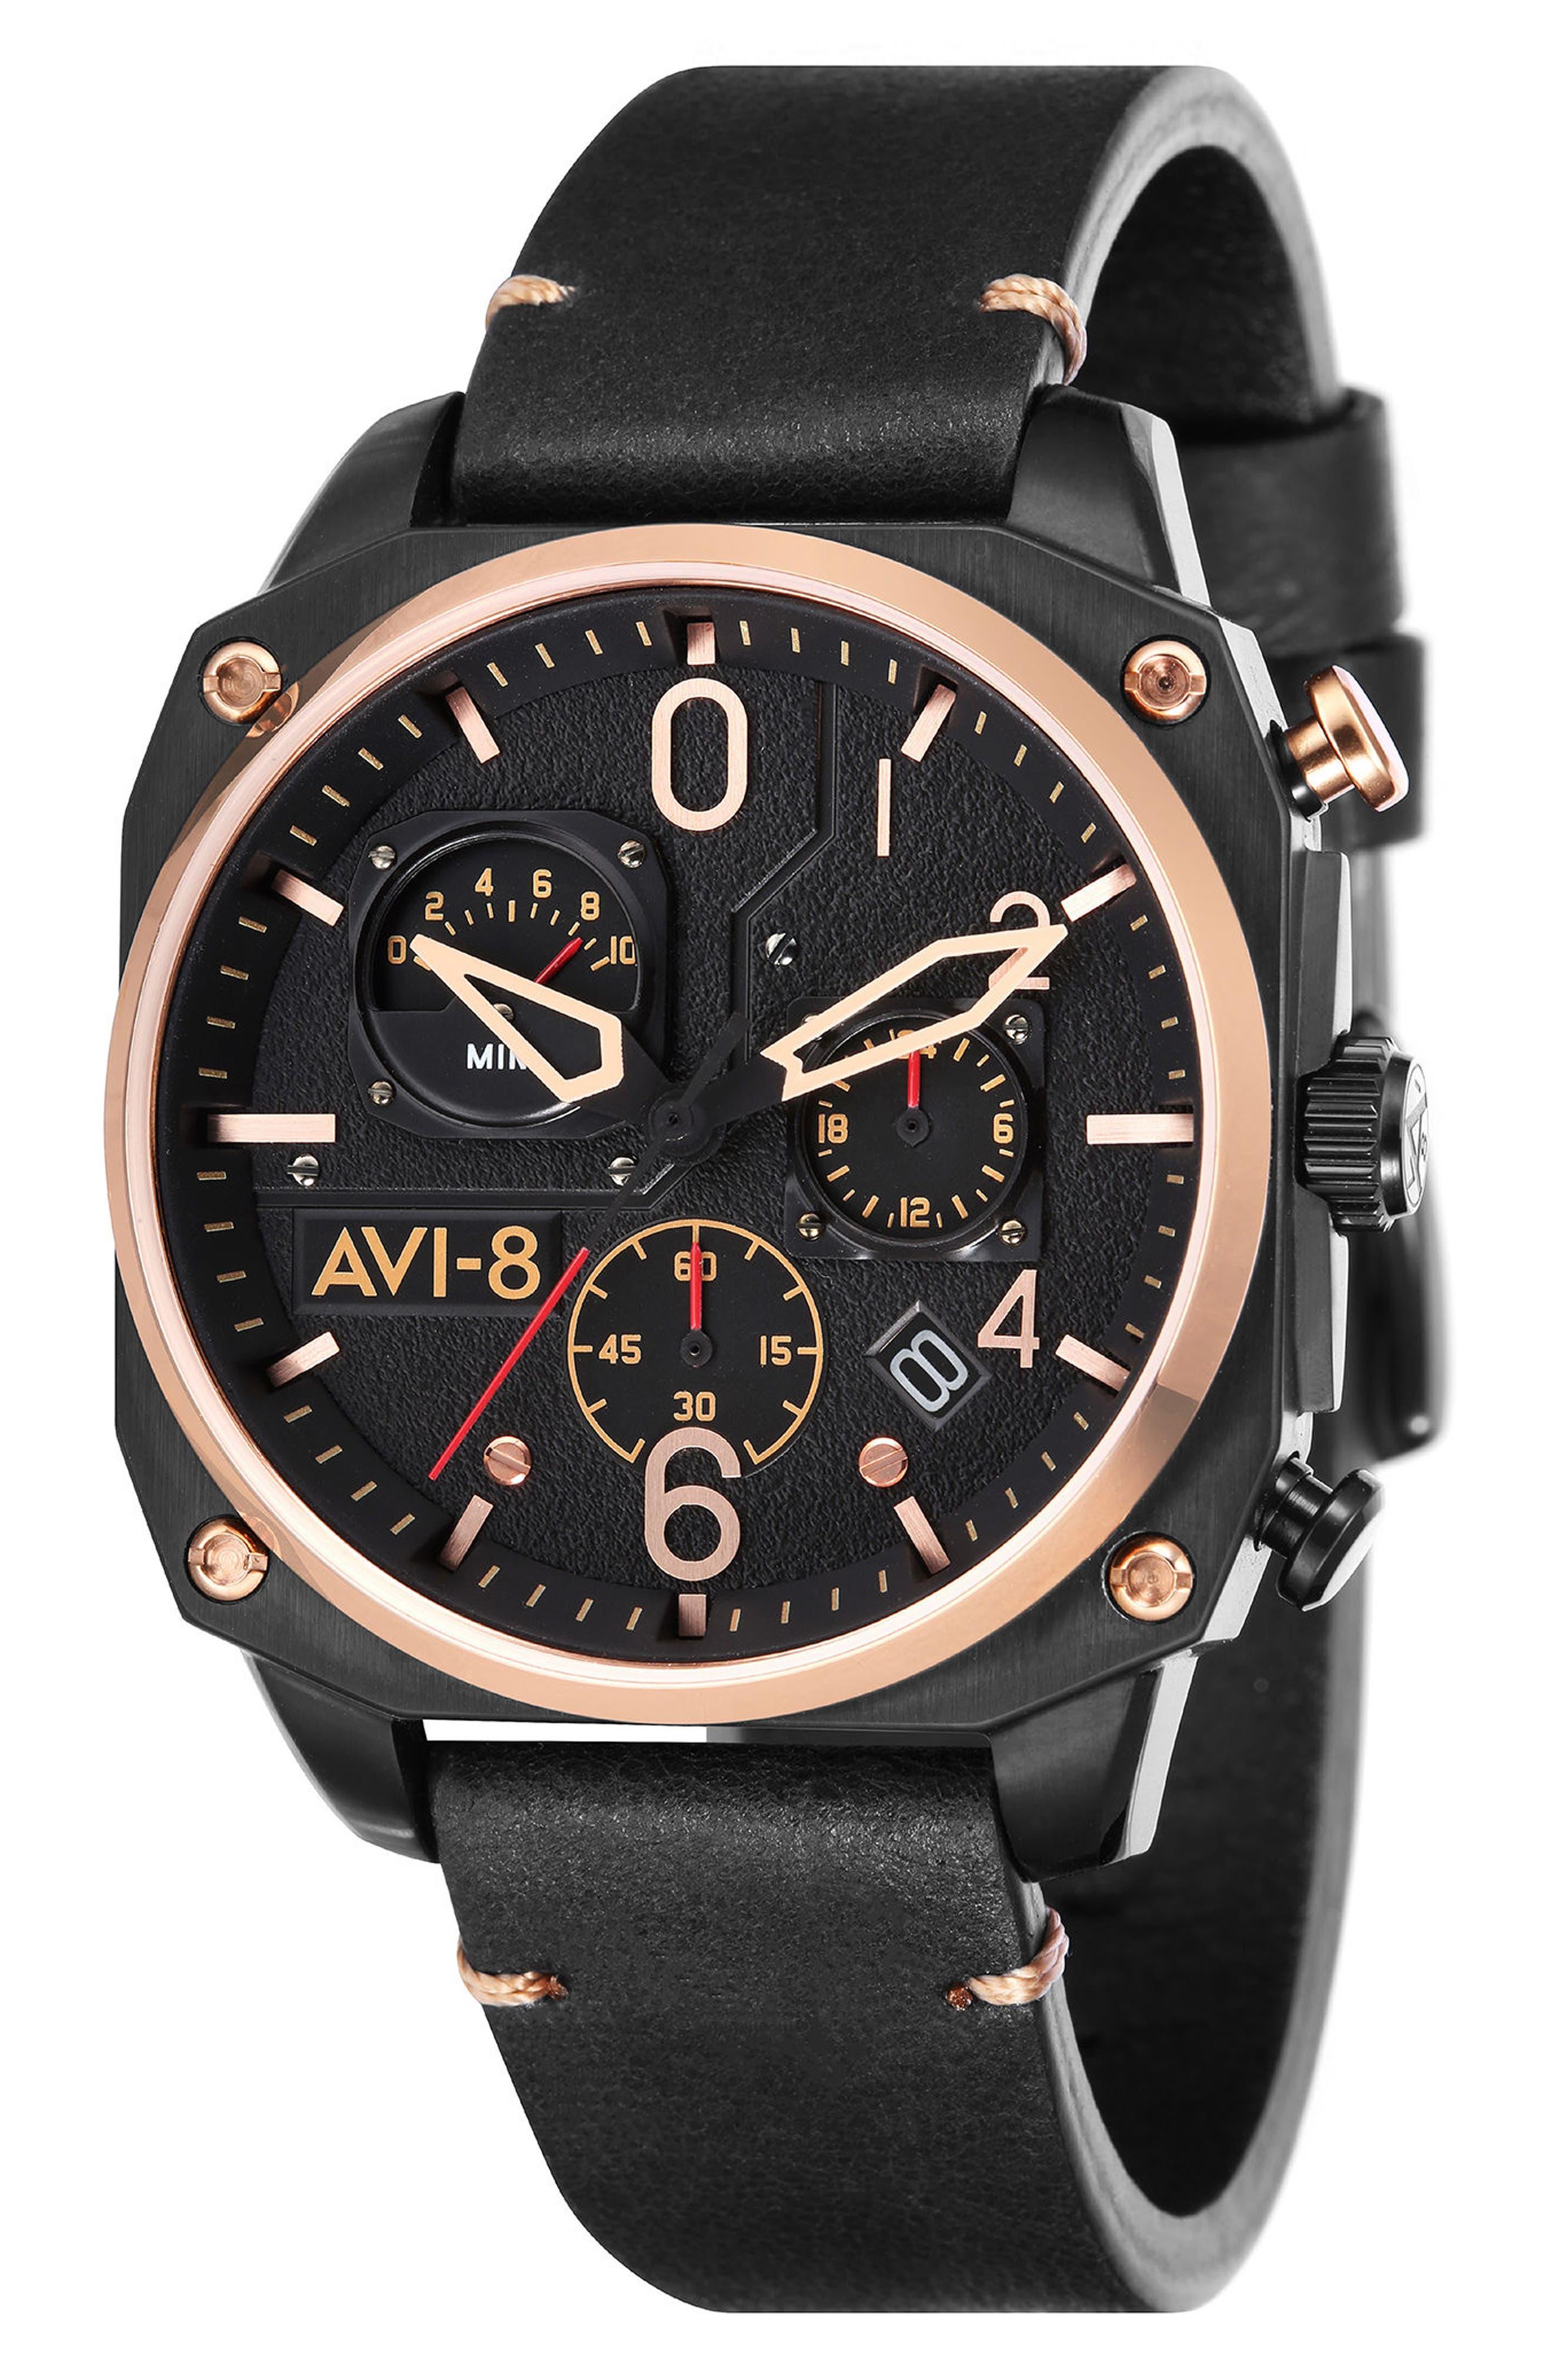 Main Image - AVI-8 Hawker Hunter Chronograph Leather Strap Watch, 45mm